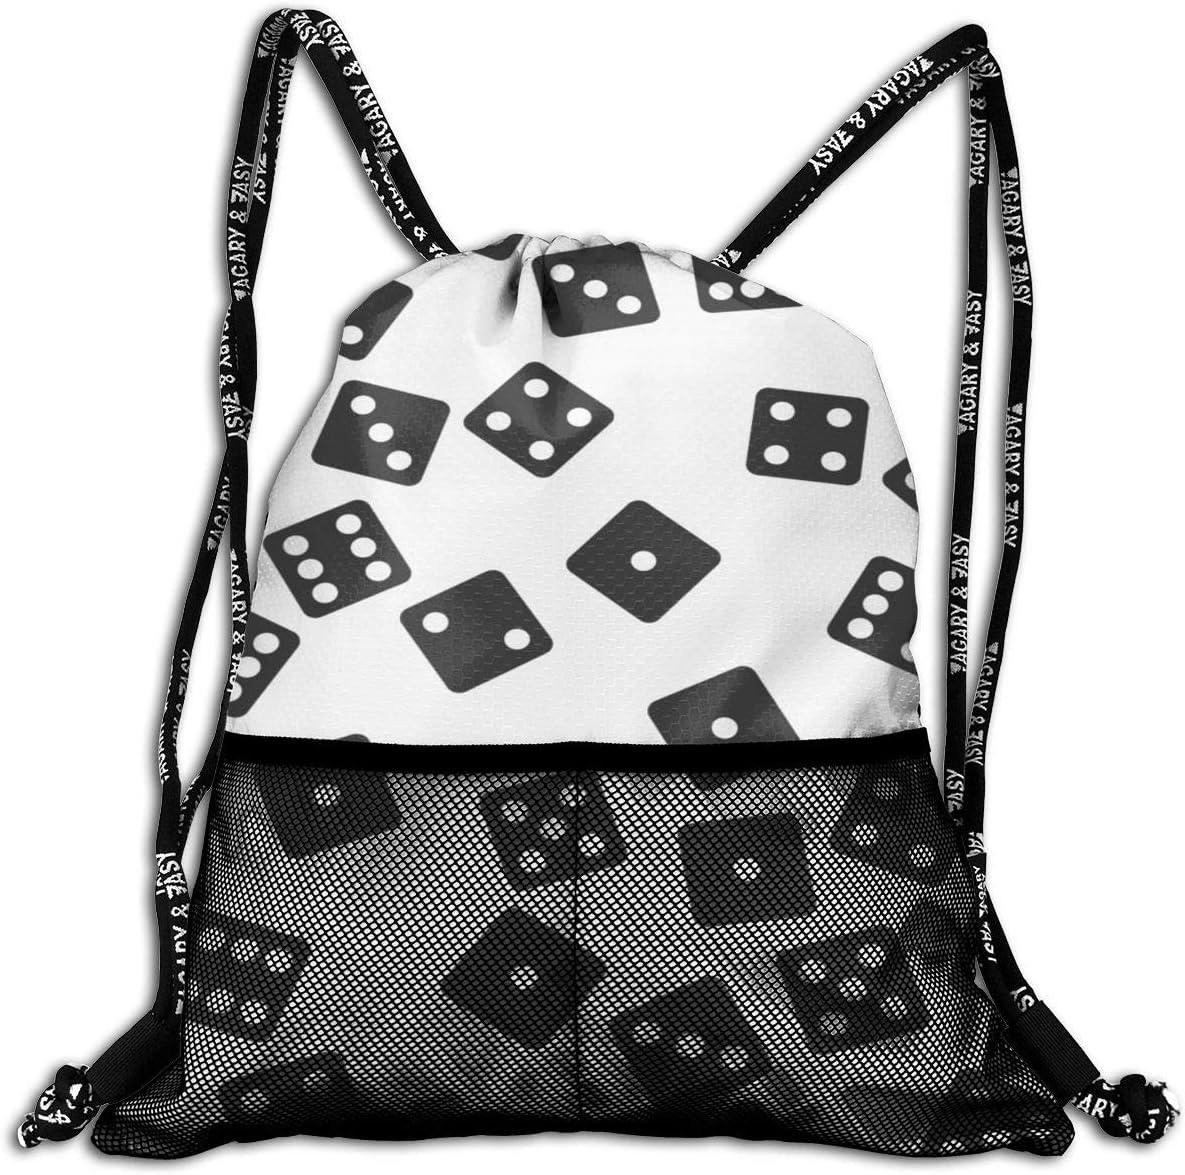 Drawstring Backpack Dice Gym Bag